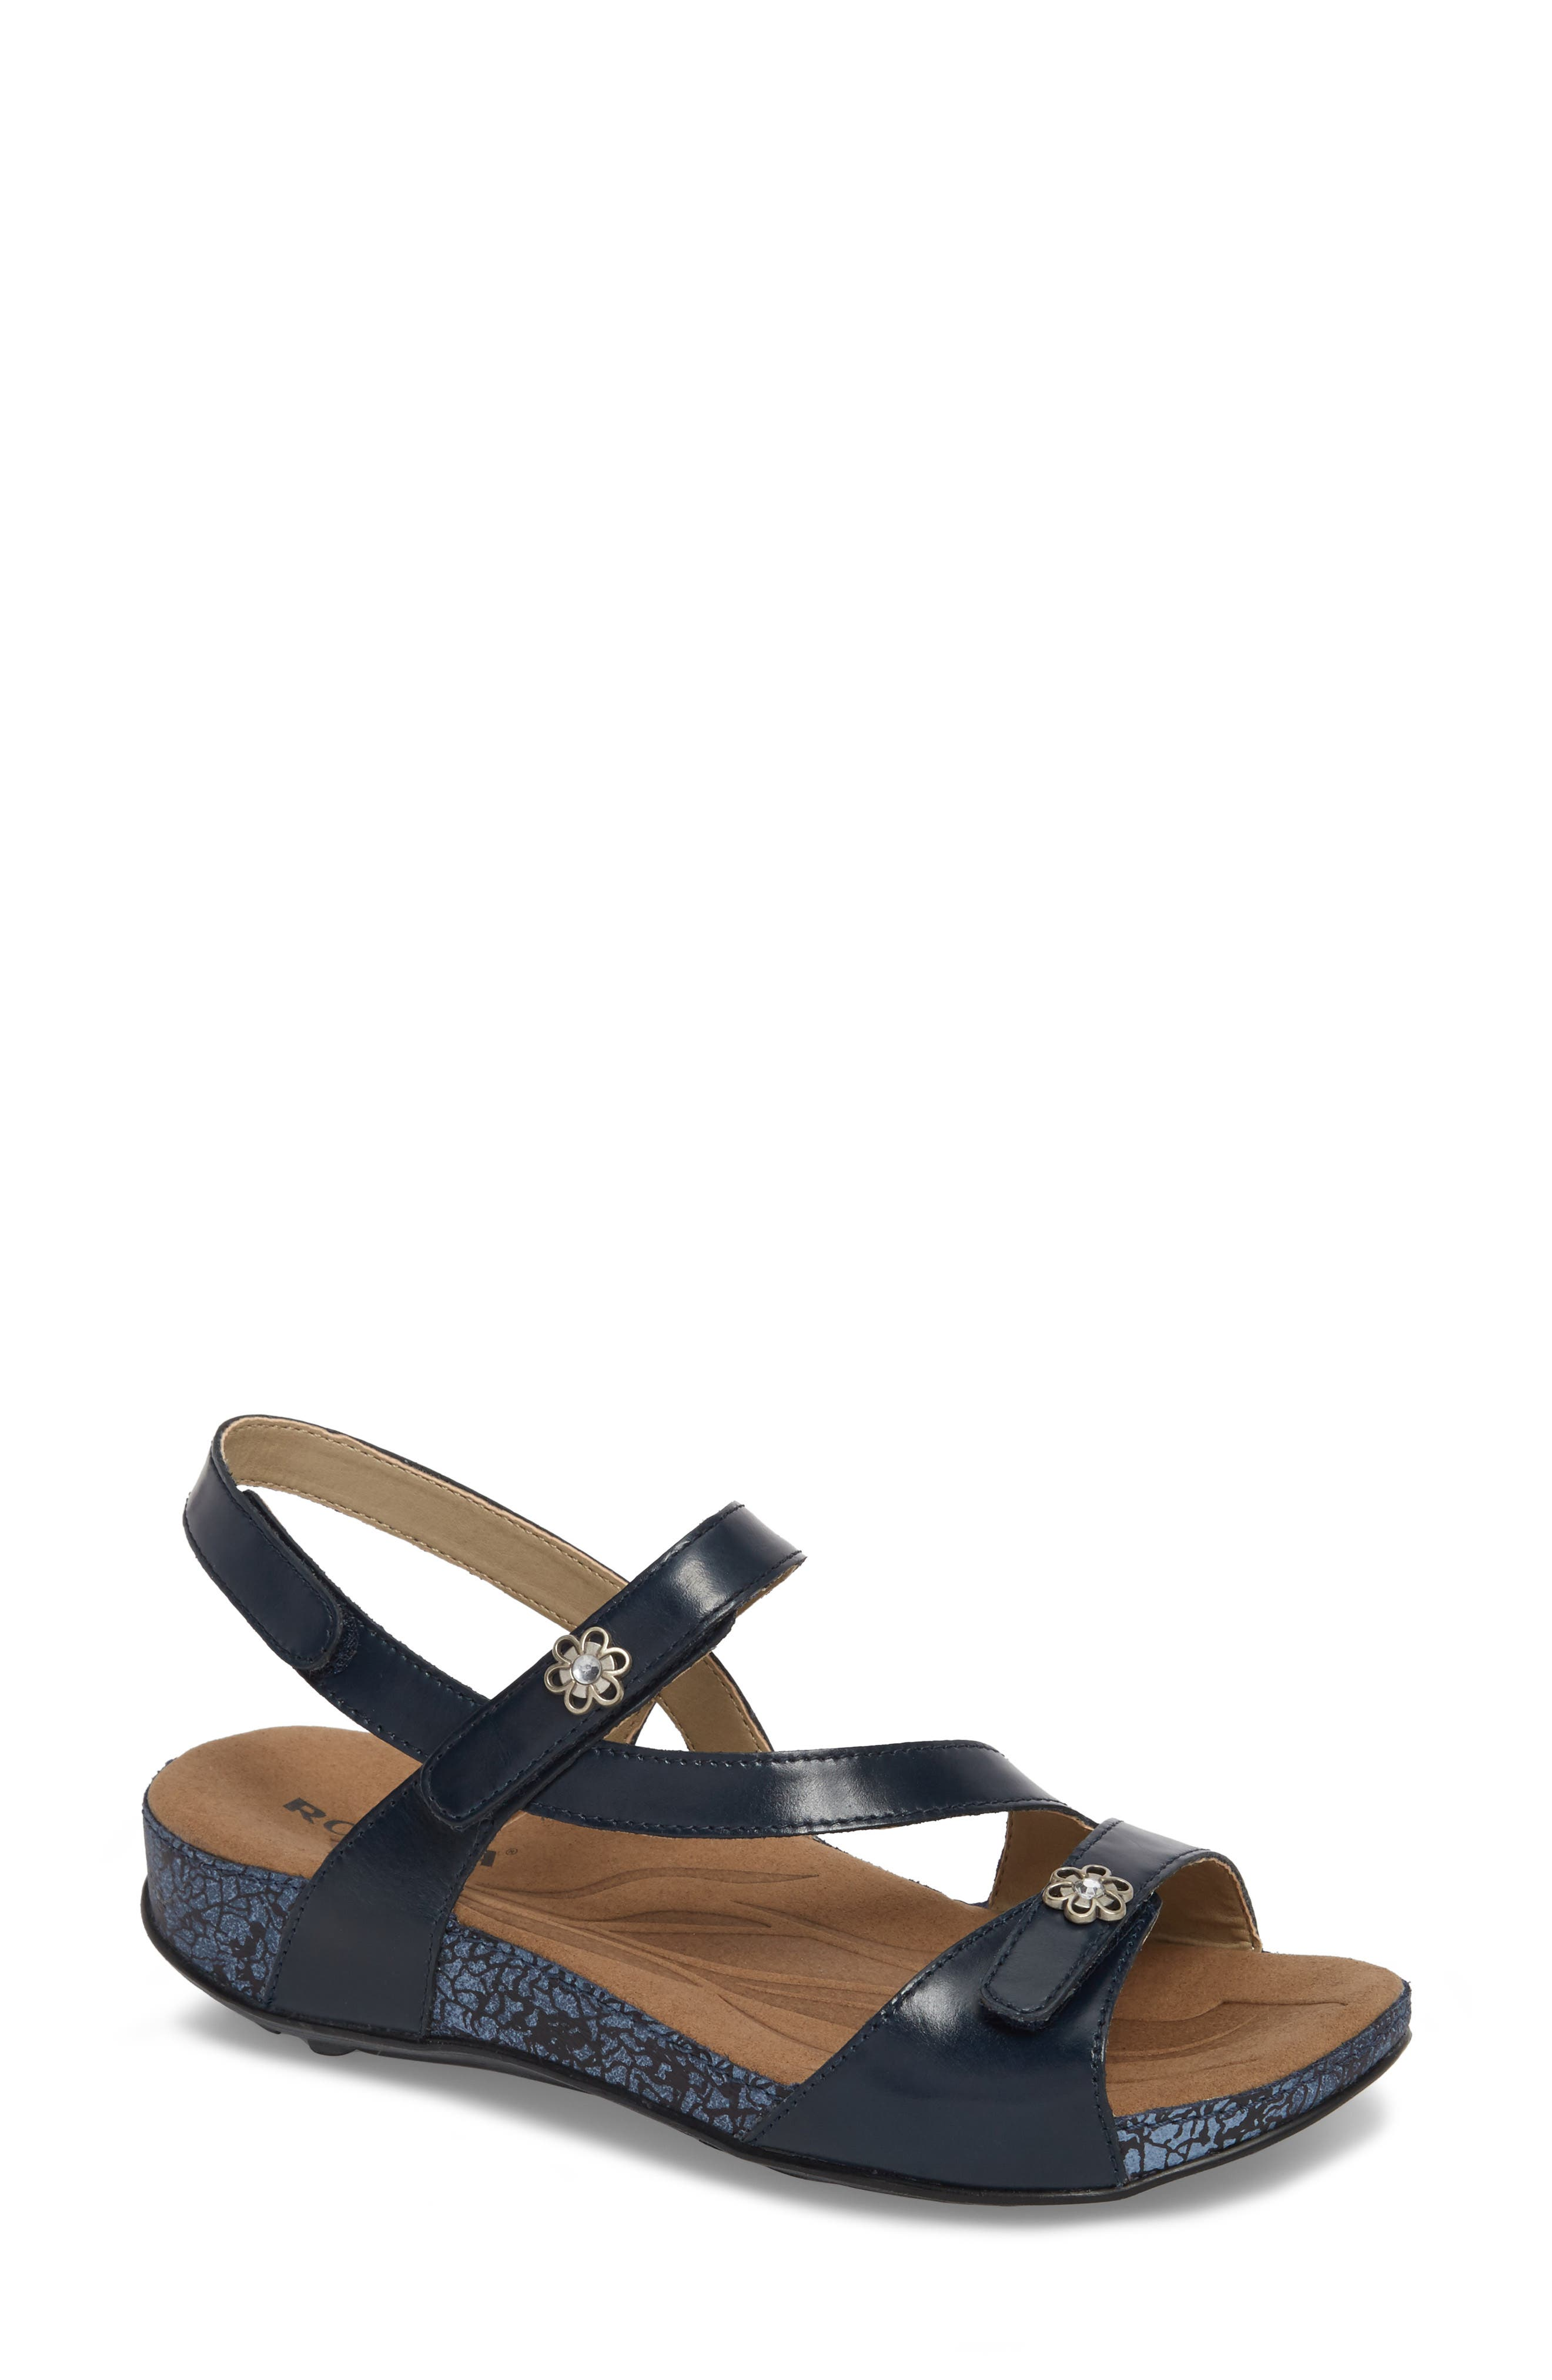 Fidschi 54 Sandal,                         Main,                         color, JEANS LEATHER